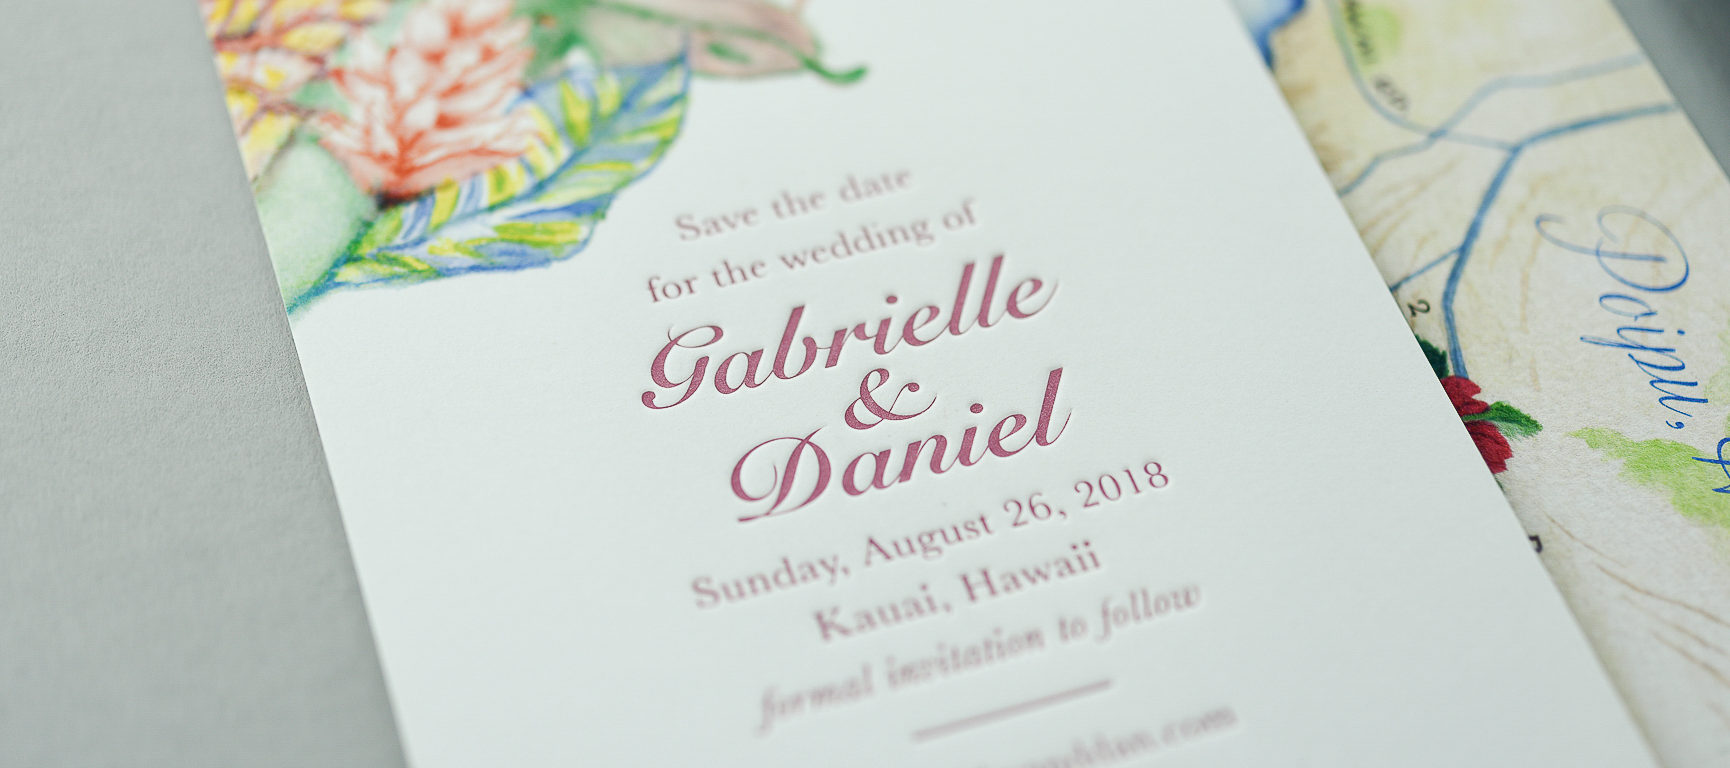 Kauai Hawaii Letterpress Wedding Invitations | Pike St  Press